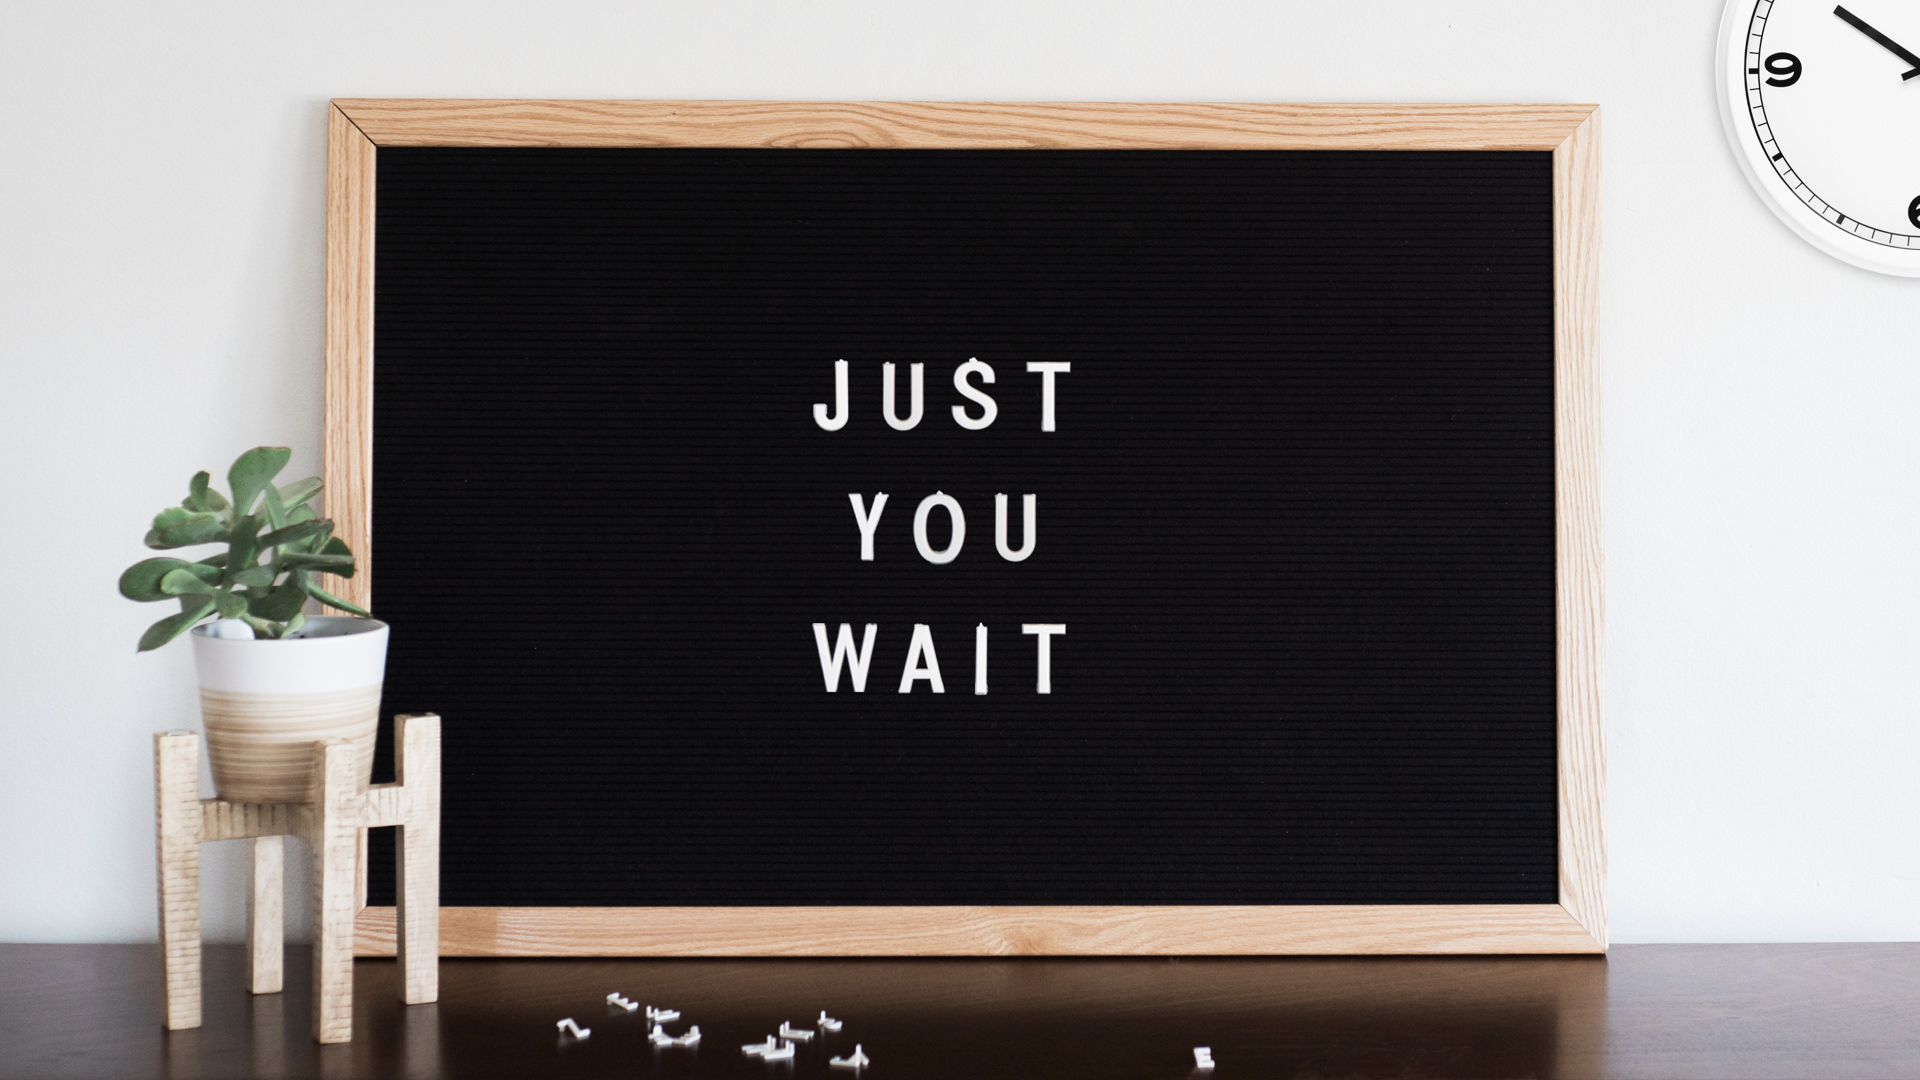 Just You Wait series artwork.001.jpeg